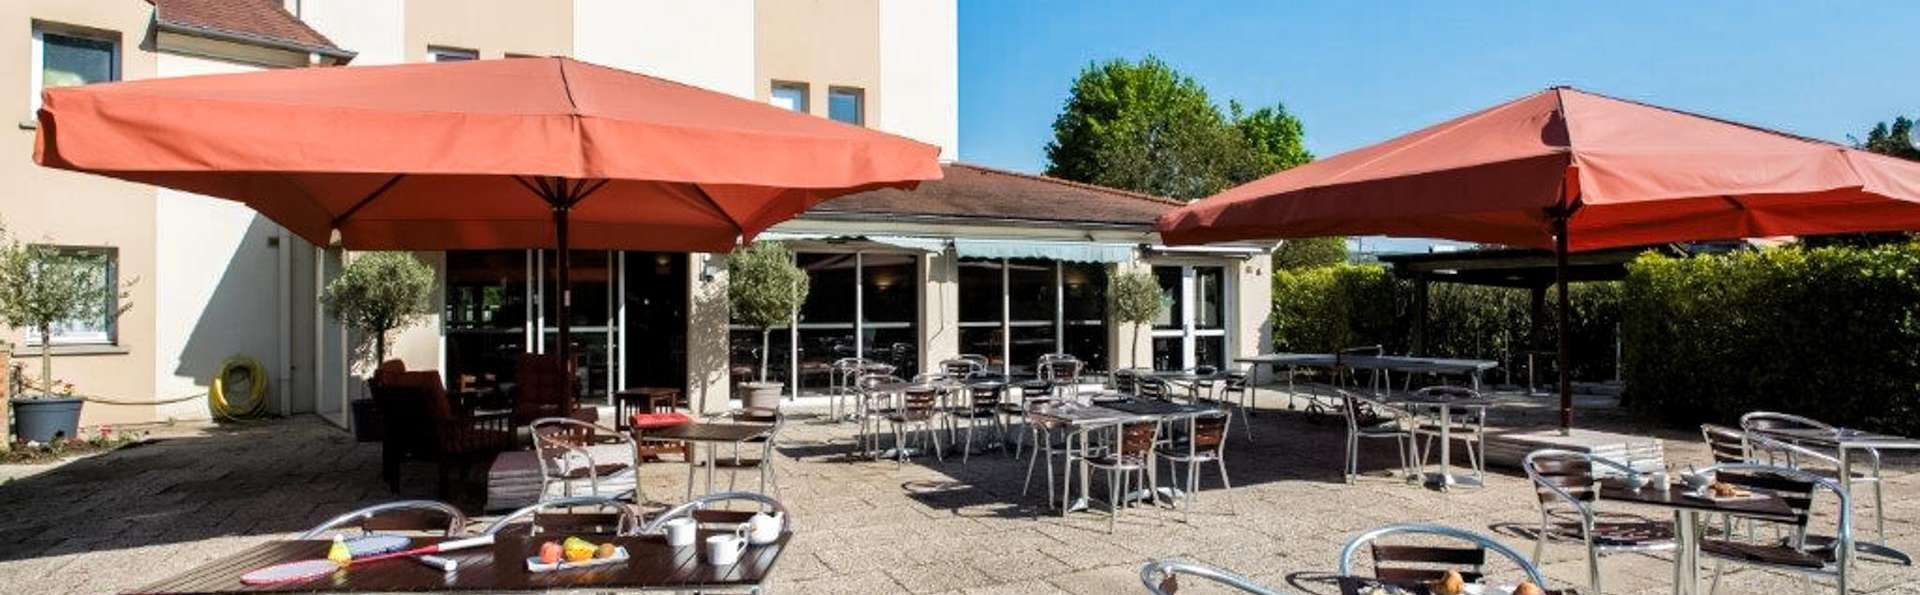 Hôtel ibis Château-Thierry - EDIT_TERRACE_02.jpg